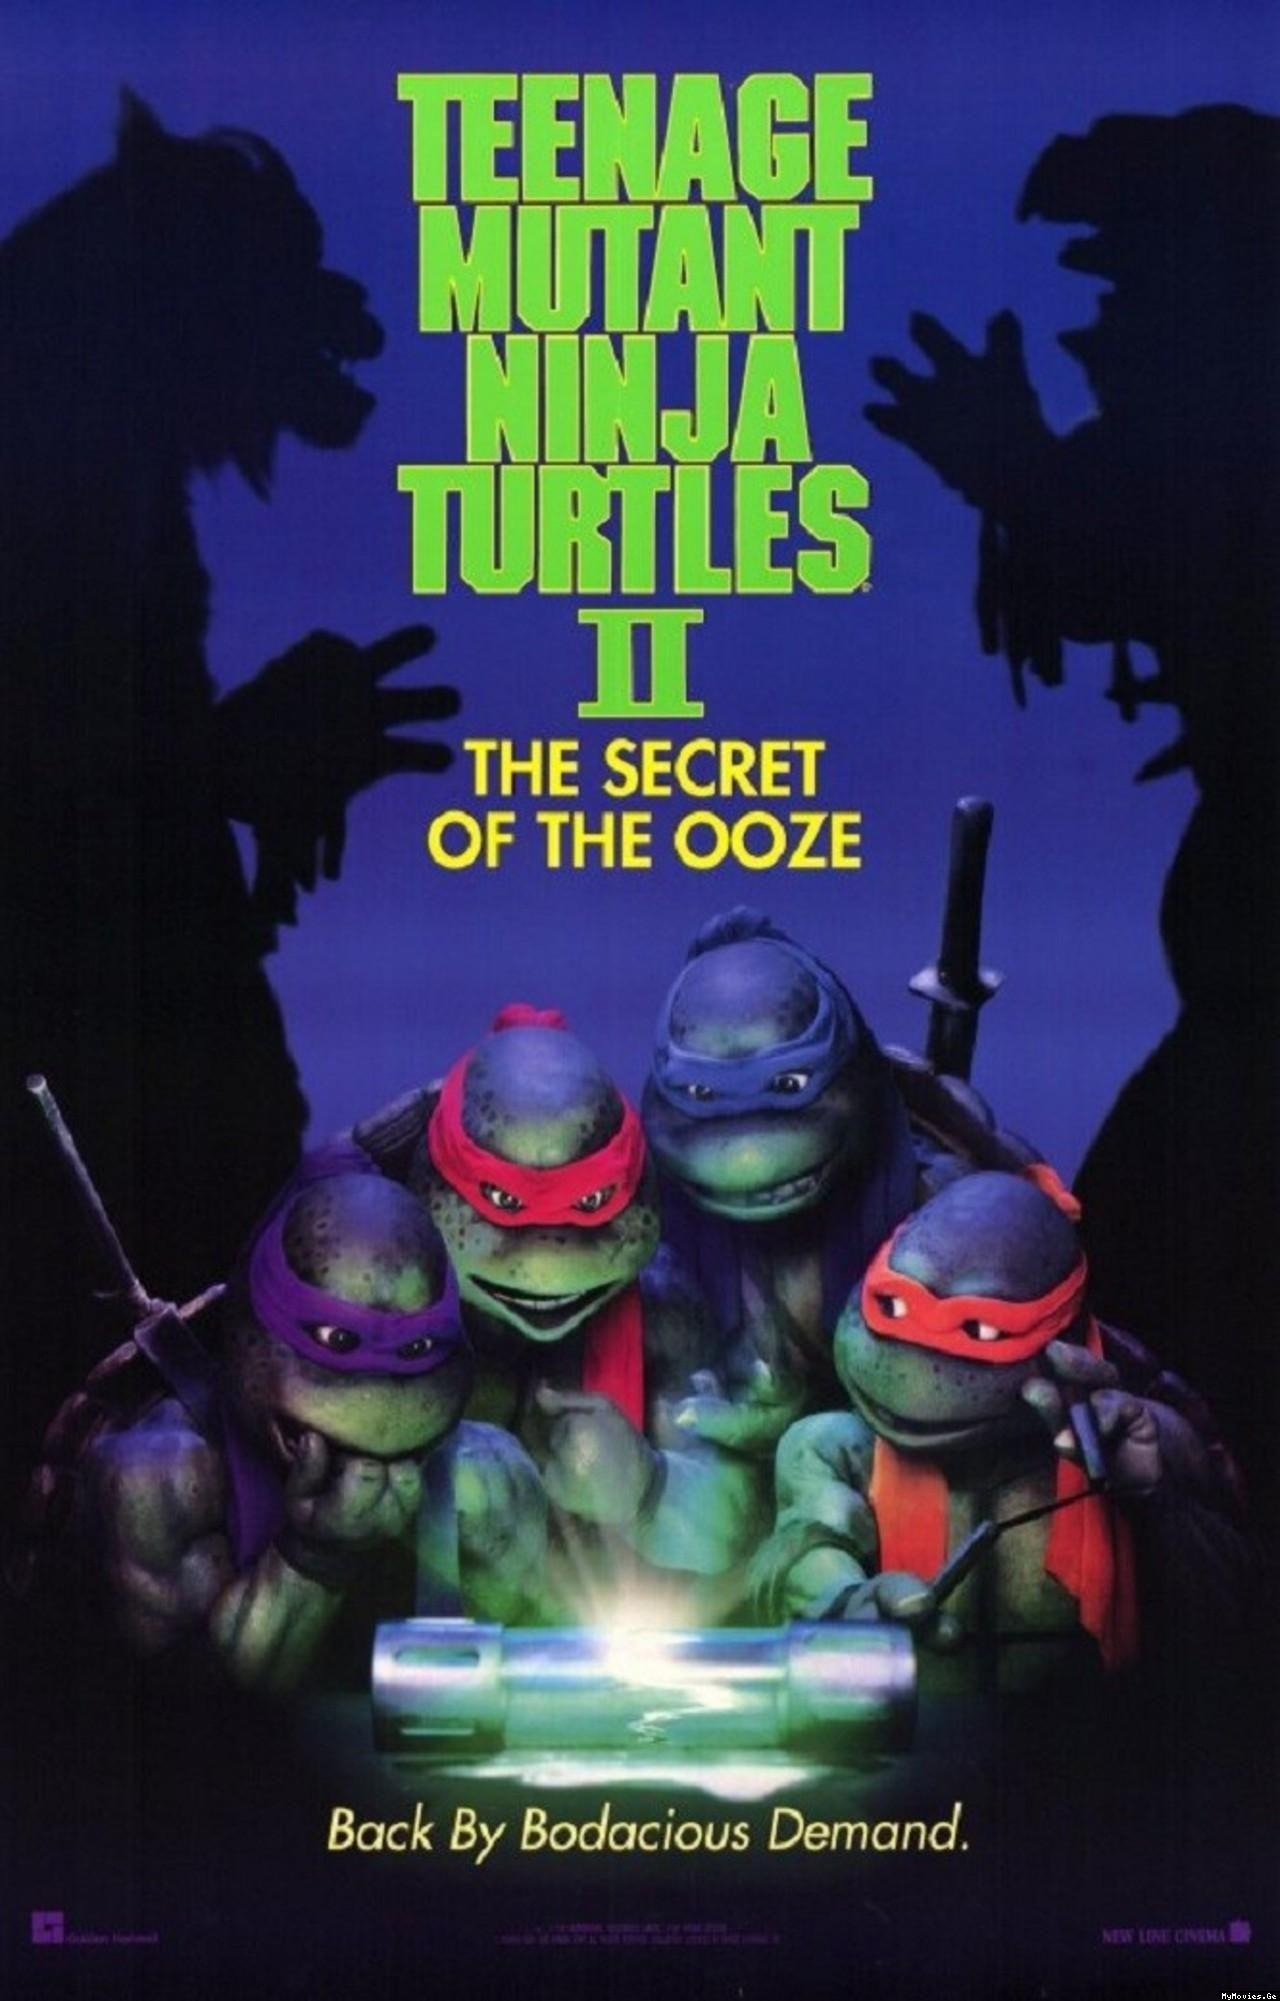 Retro review teenage mutant ninja turtles ii secret of the ooze - Teenage Mutant Ninja Turtles Ii The Secret Of The Ooze 1991